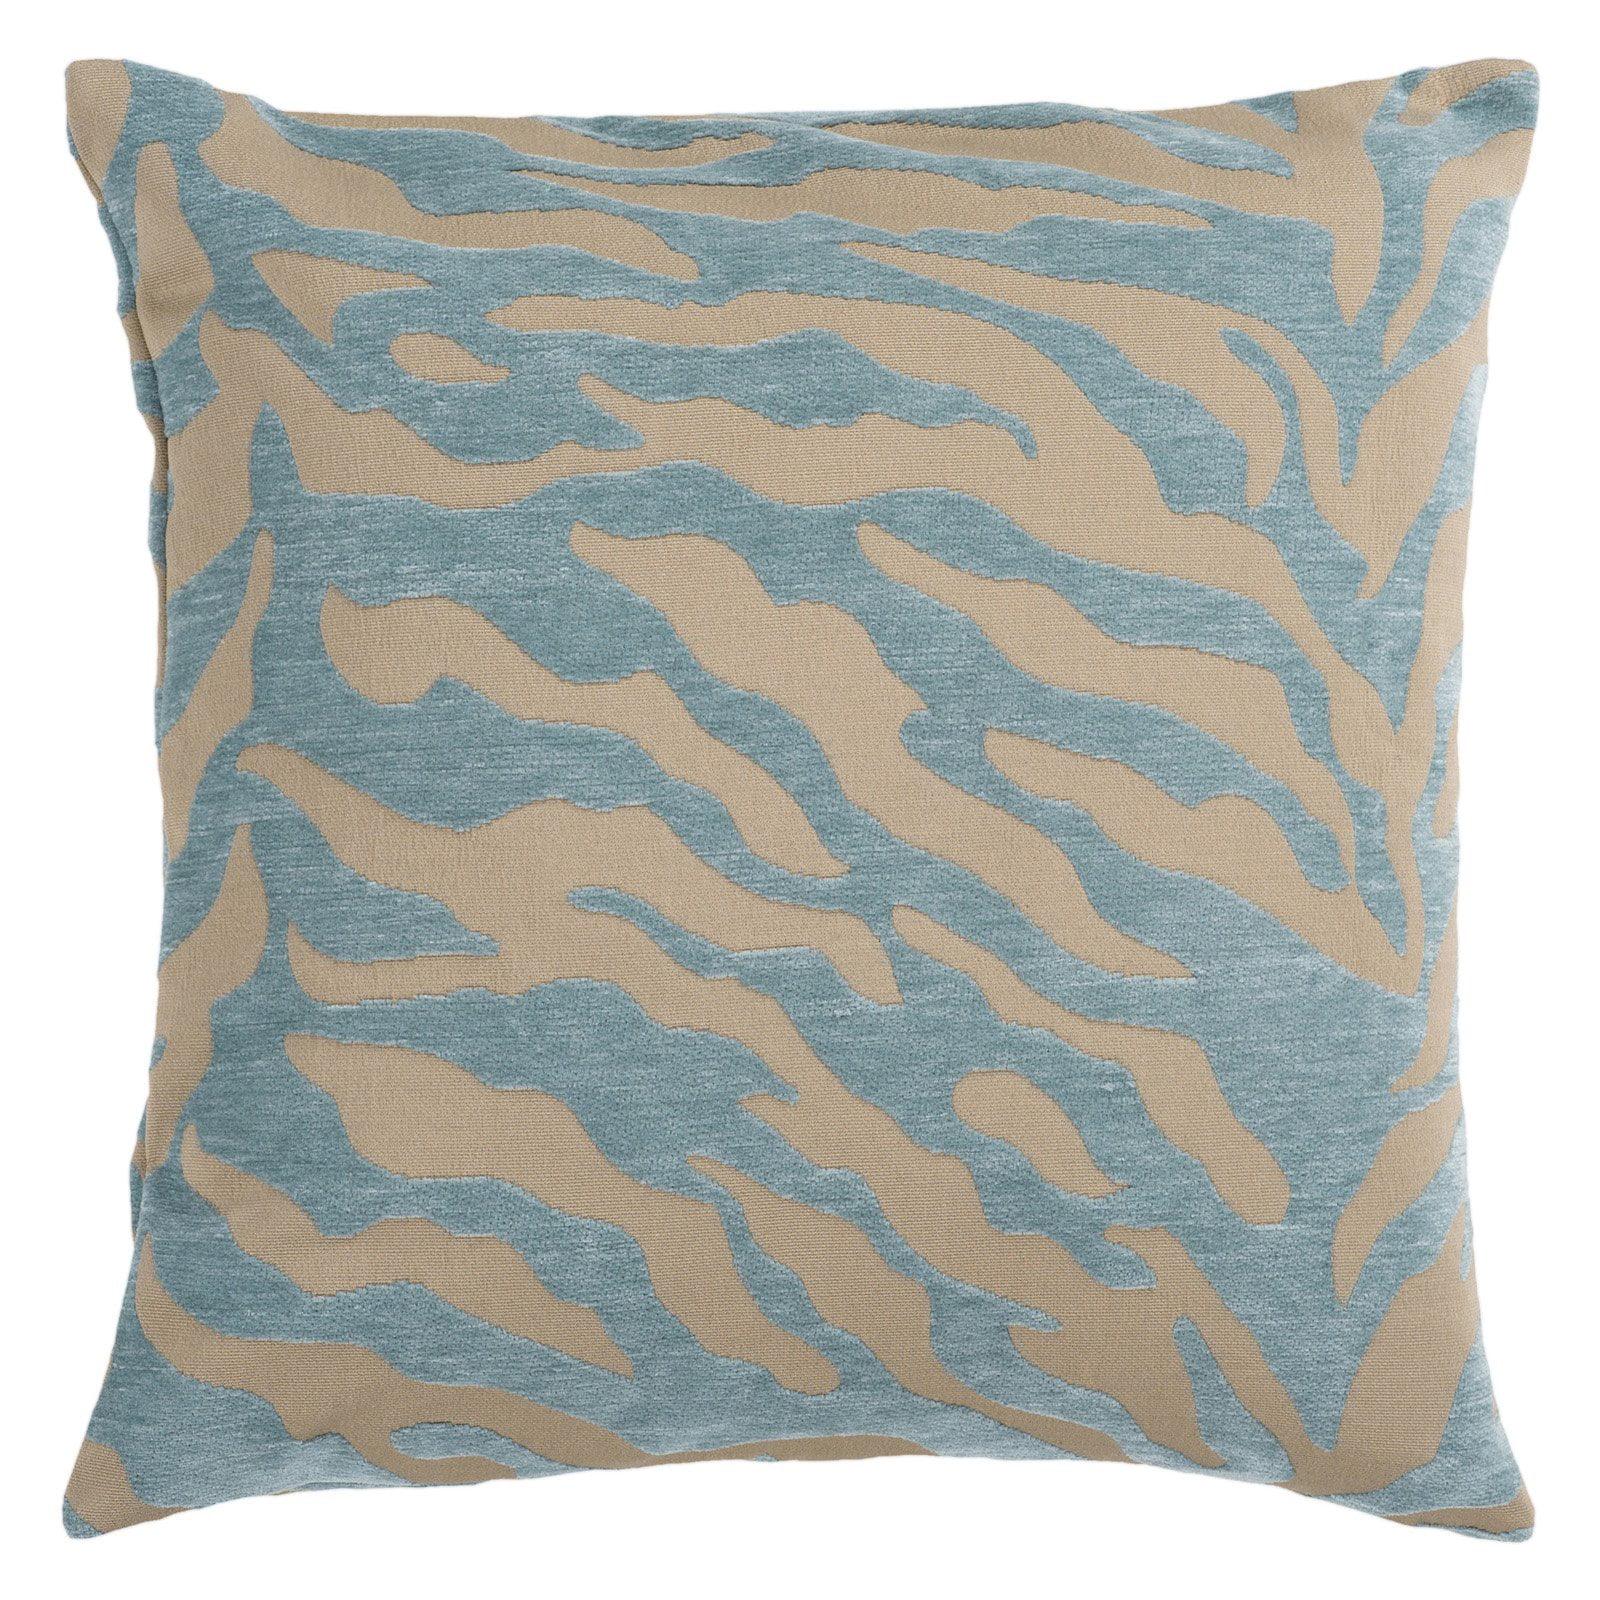 Surya Zebra Decorative Pillow Teal by Surya